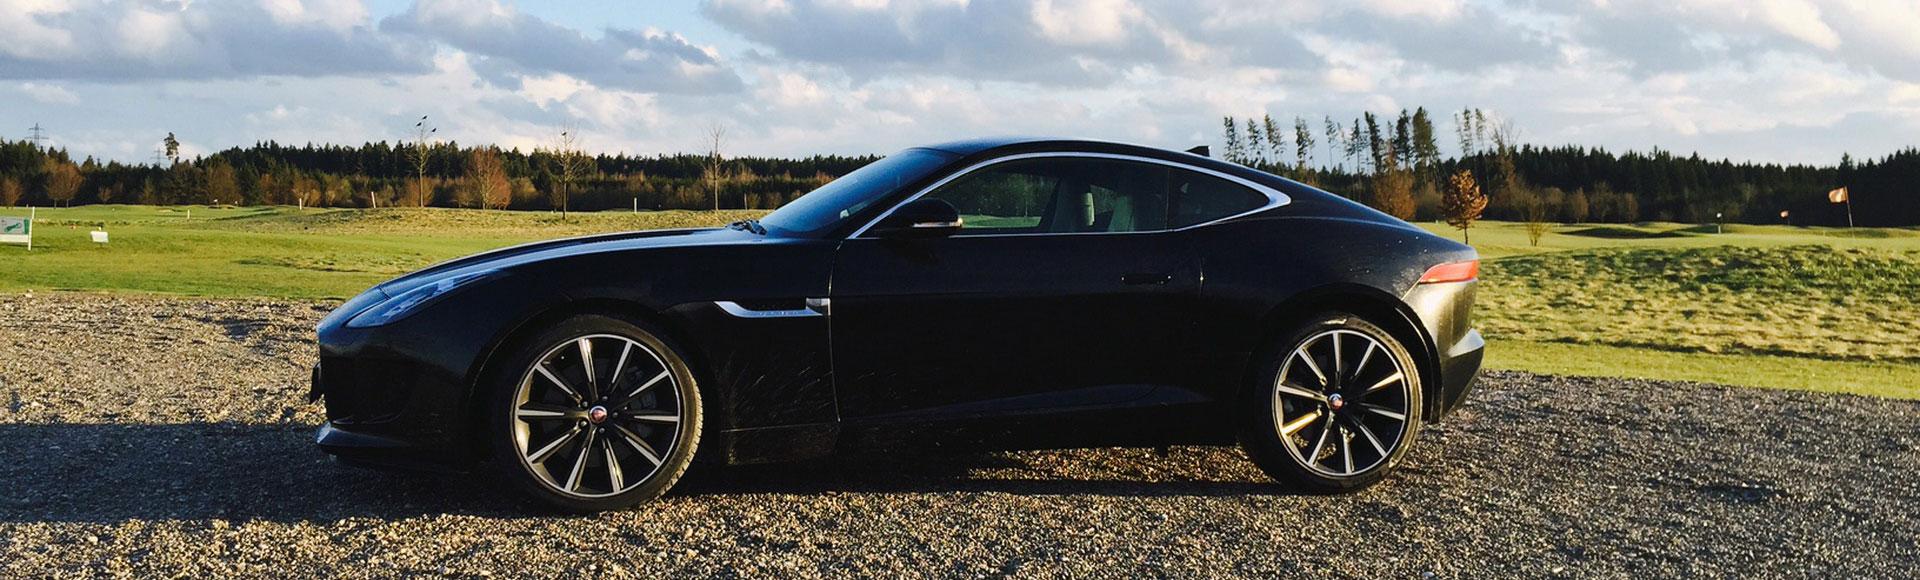 Jaguar F Type 2015 Spring 04